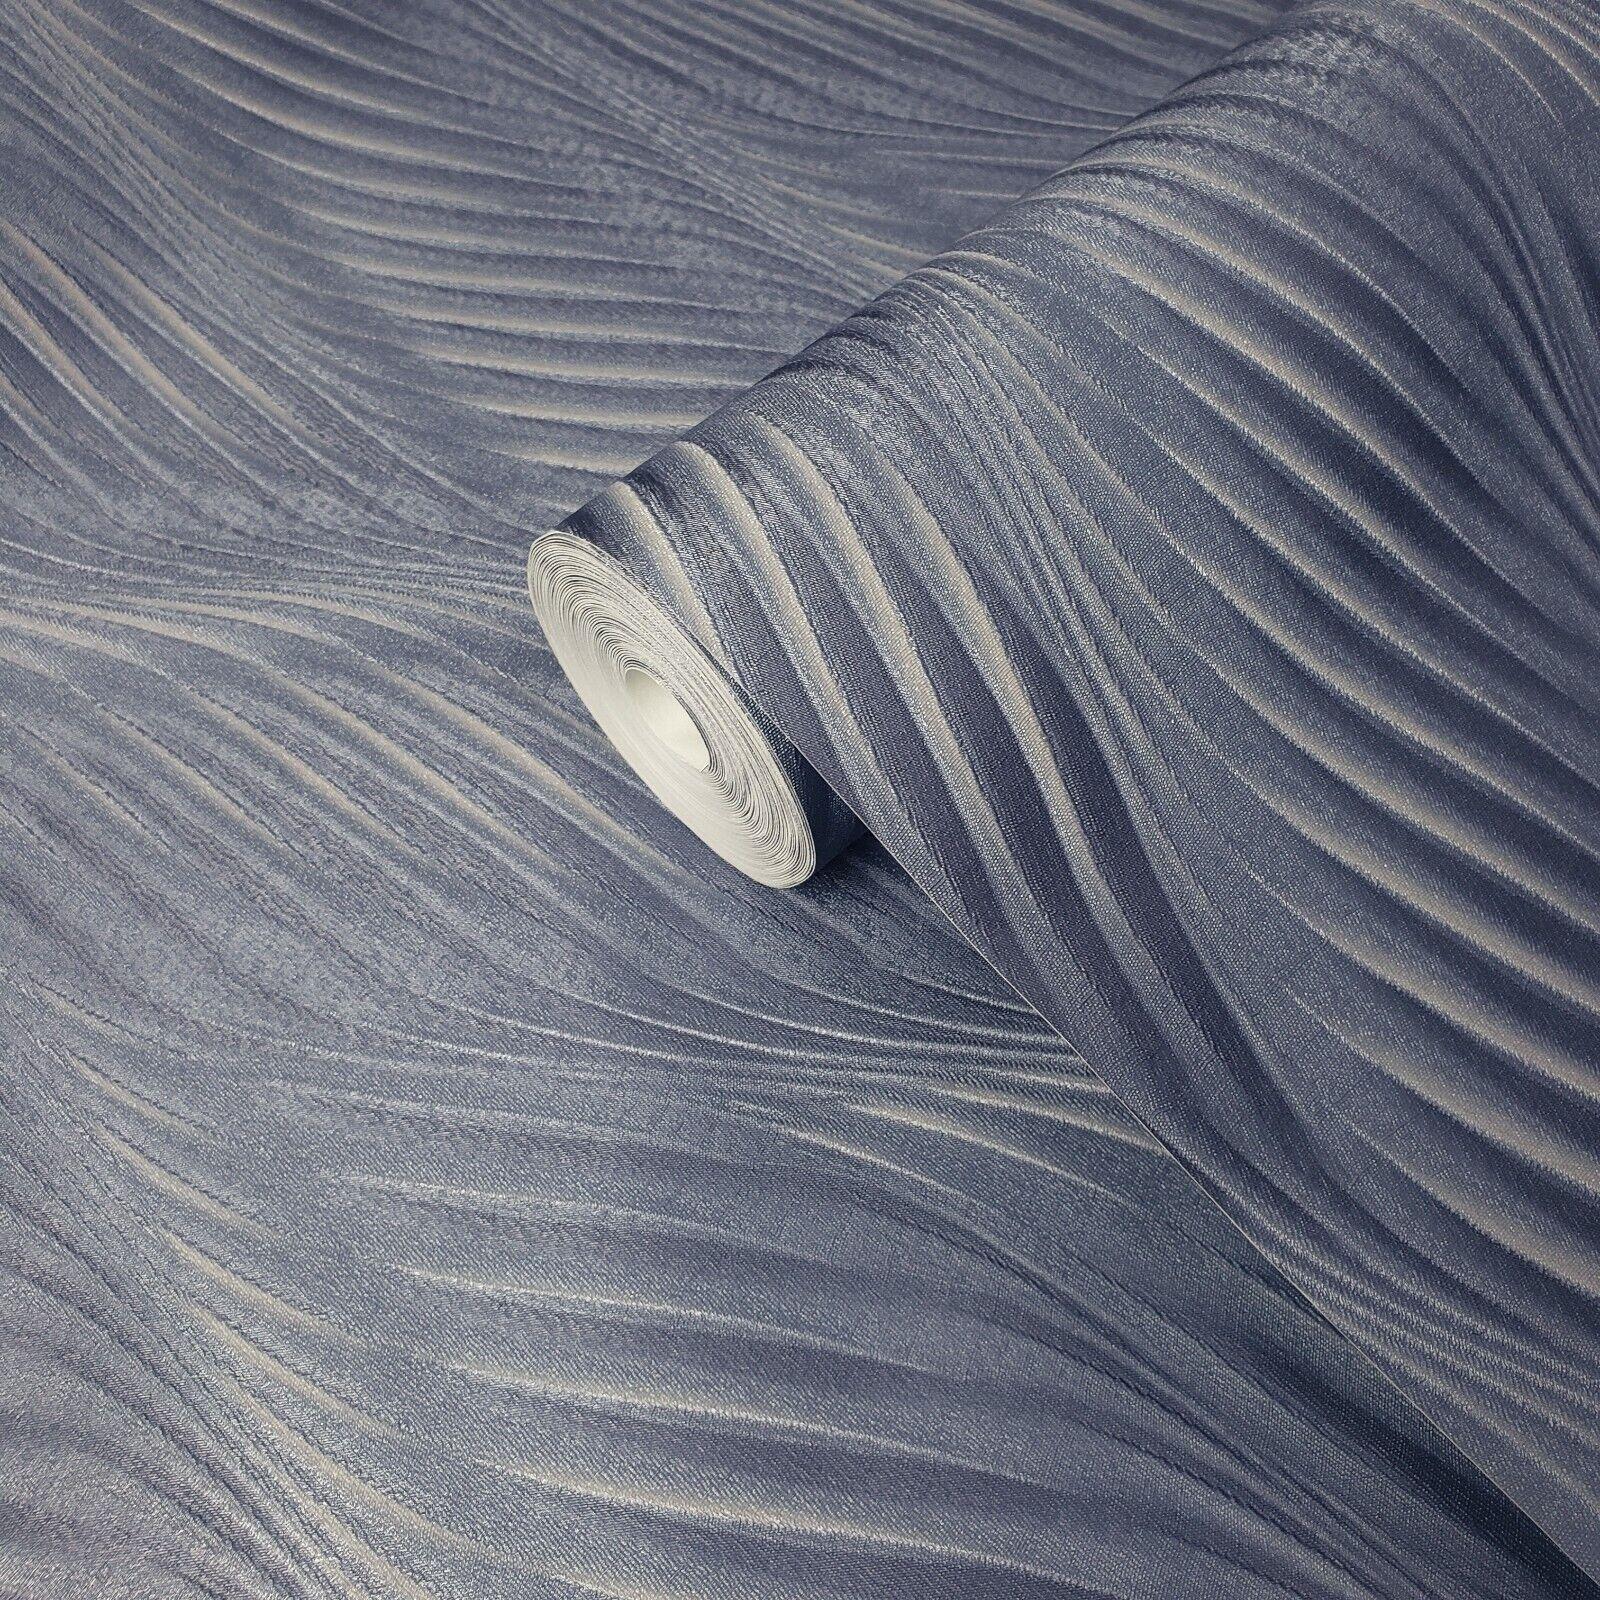 PURPLE PLUM SILVER DOTTY WAVE ORBIT LUXURY TEXTURED VINYL WALLPAPER FD14843